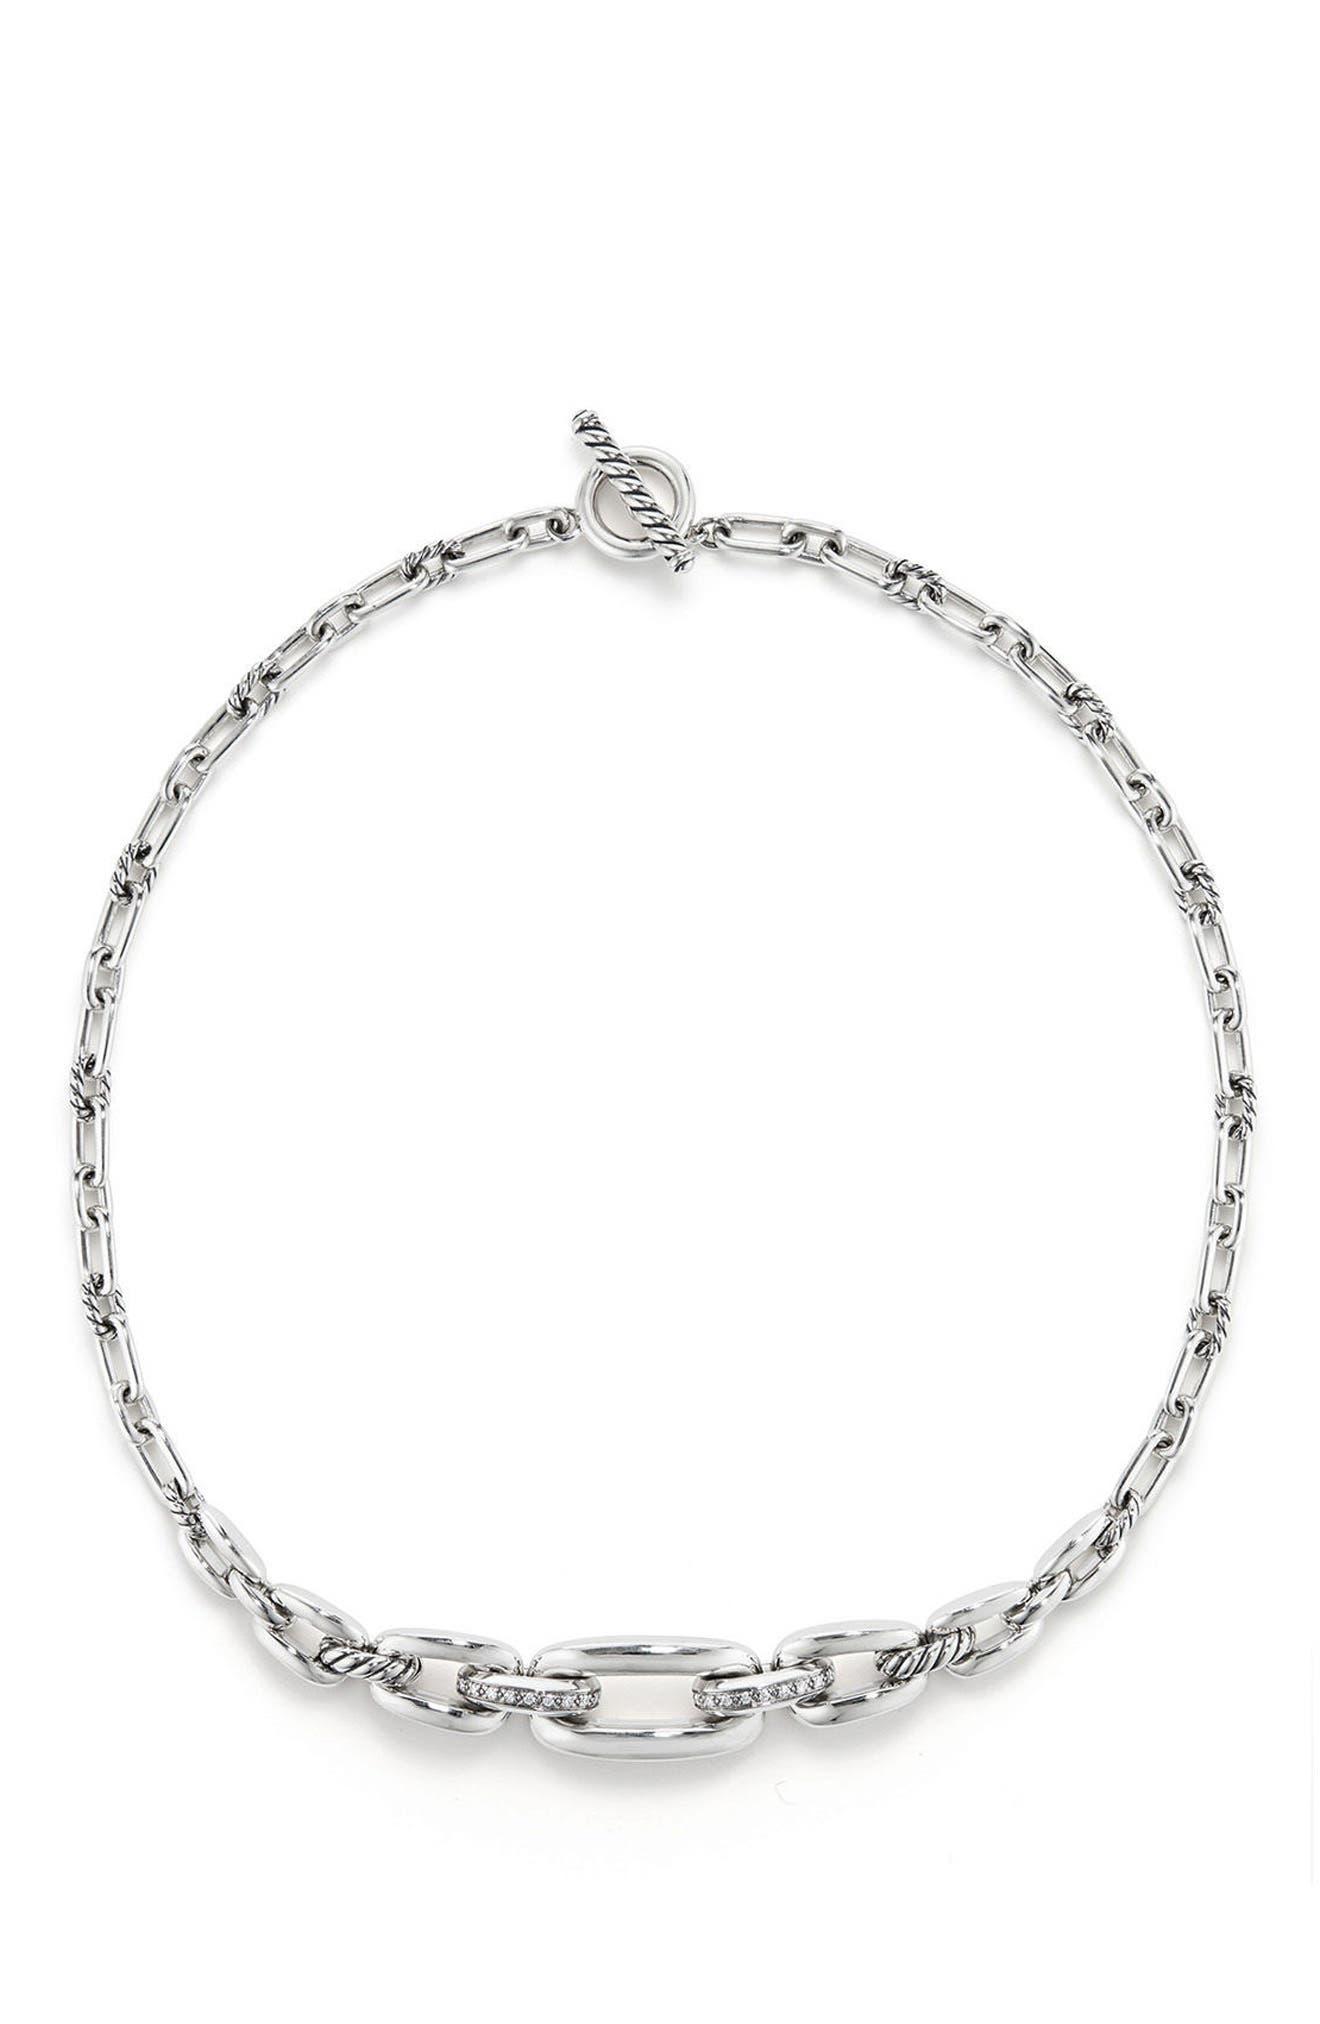 Main Image - David Yurman Wellesley Link Chain Station Necklace with Diamonds